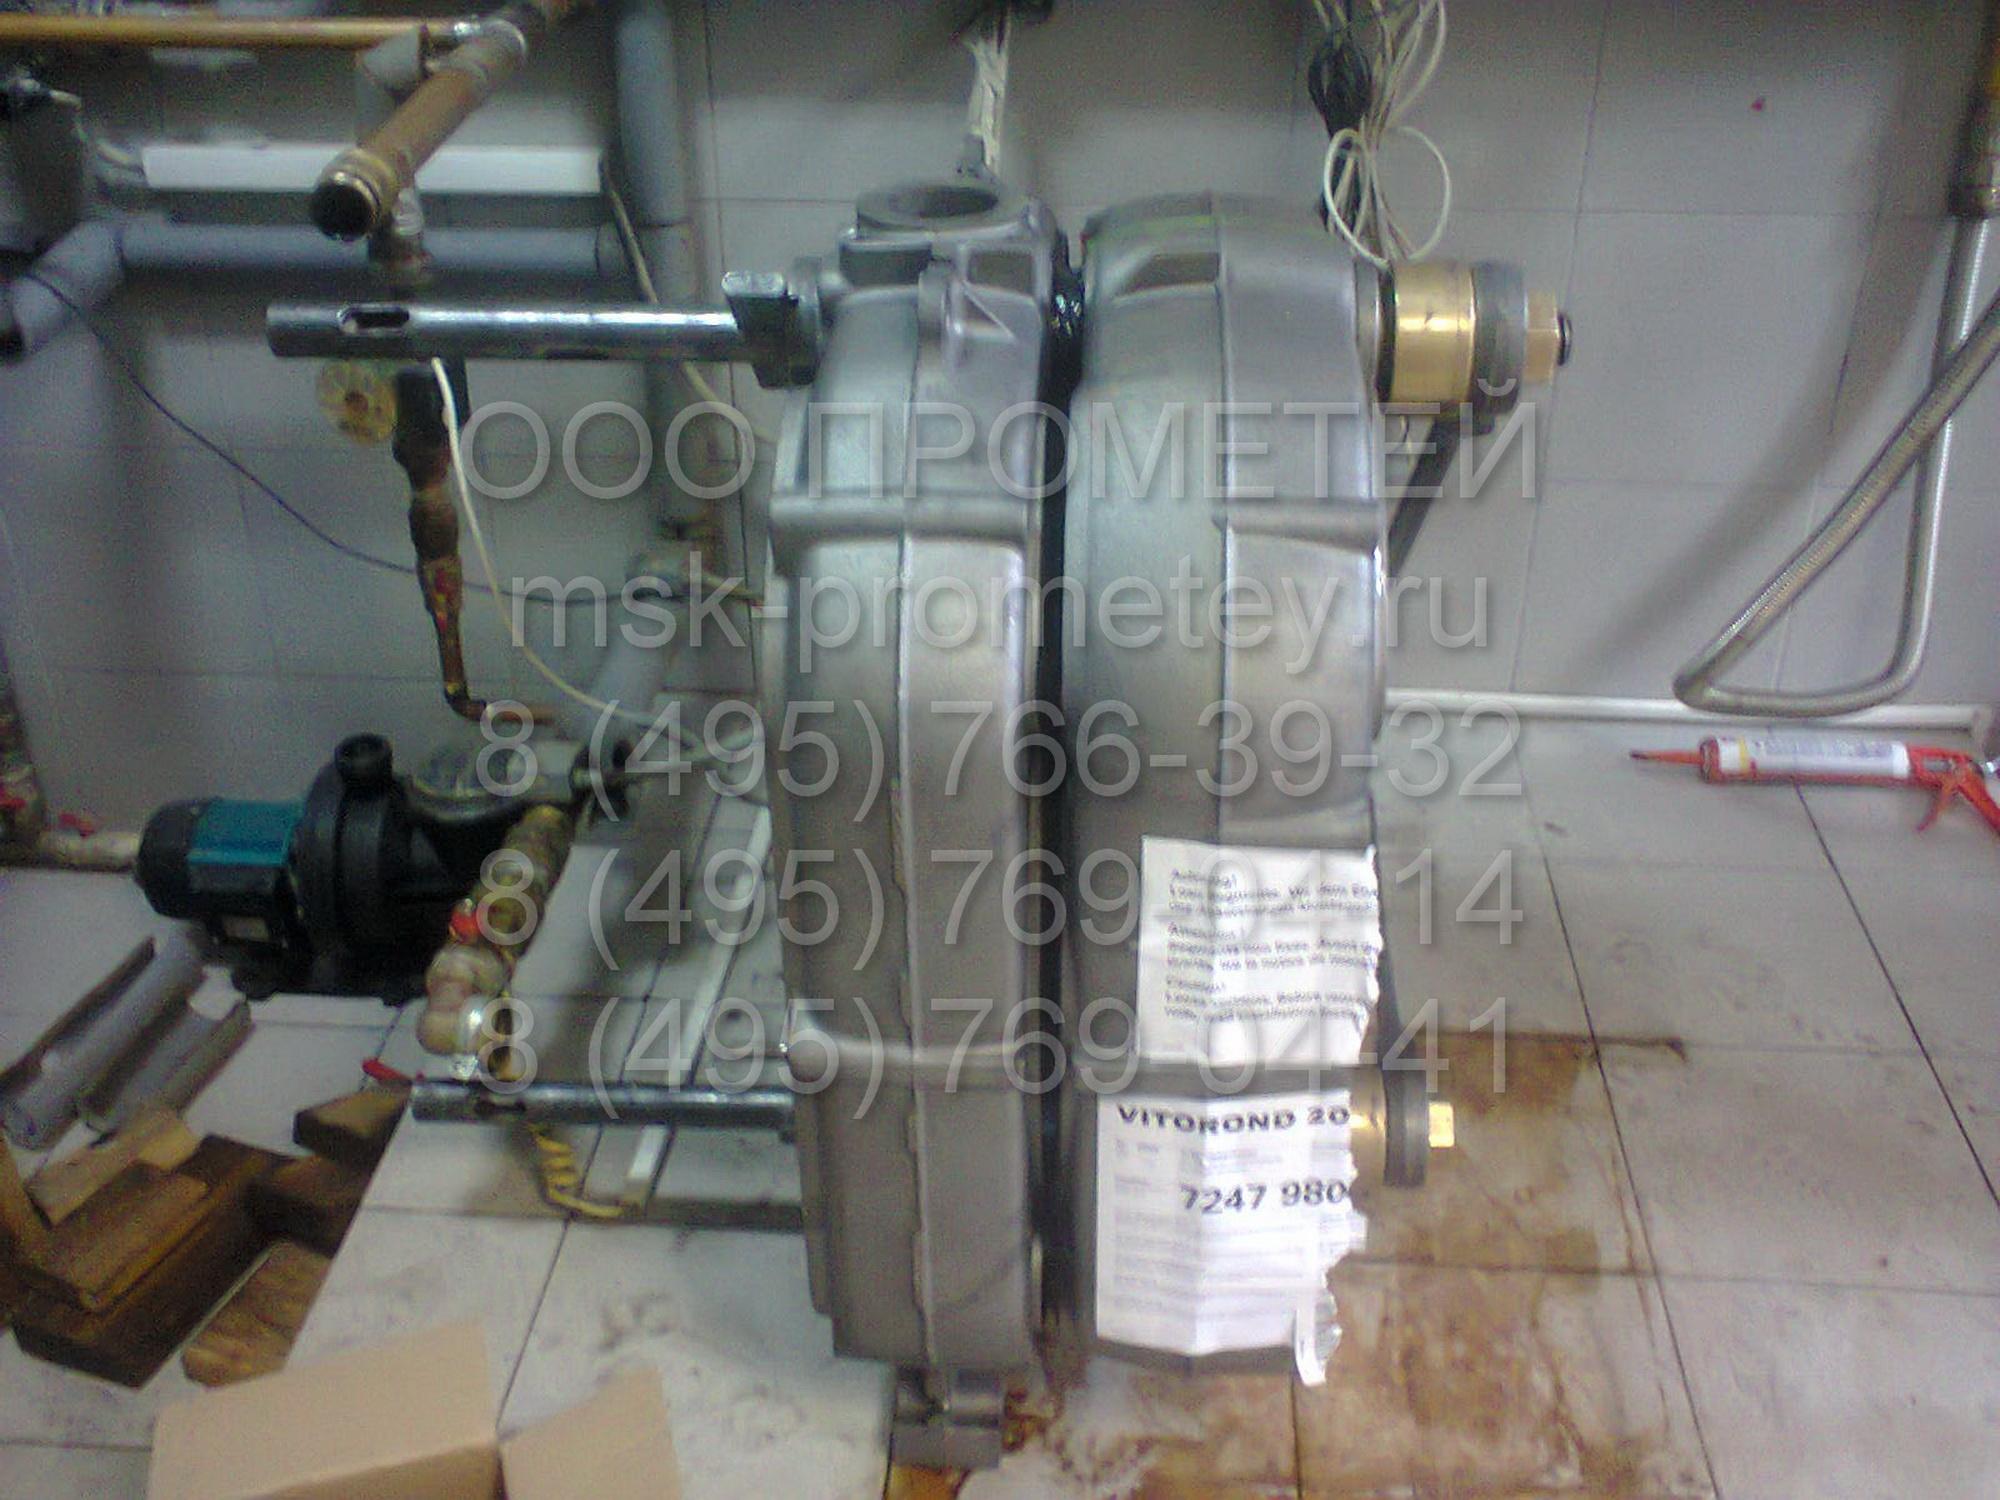 Теплообменник vitorond 200 схемы прочистки теплообменников